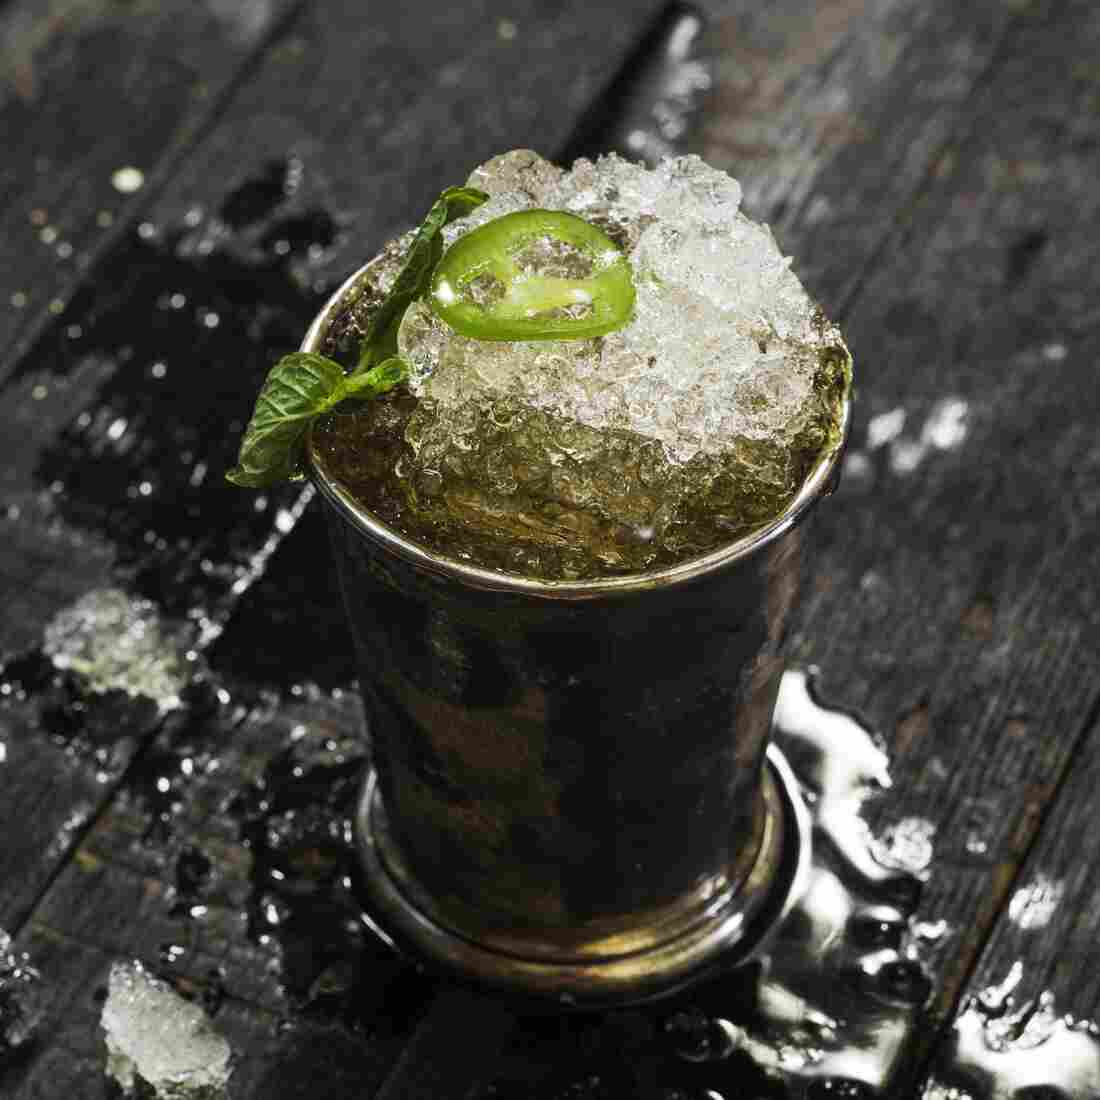 Jalapeño-Spiked Bourbon Julep